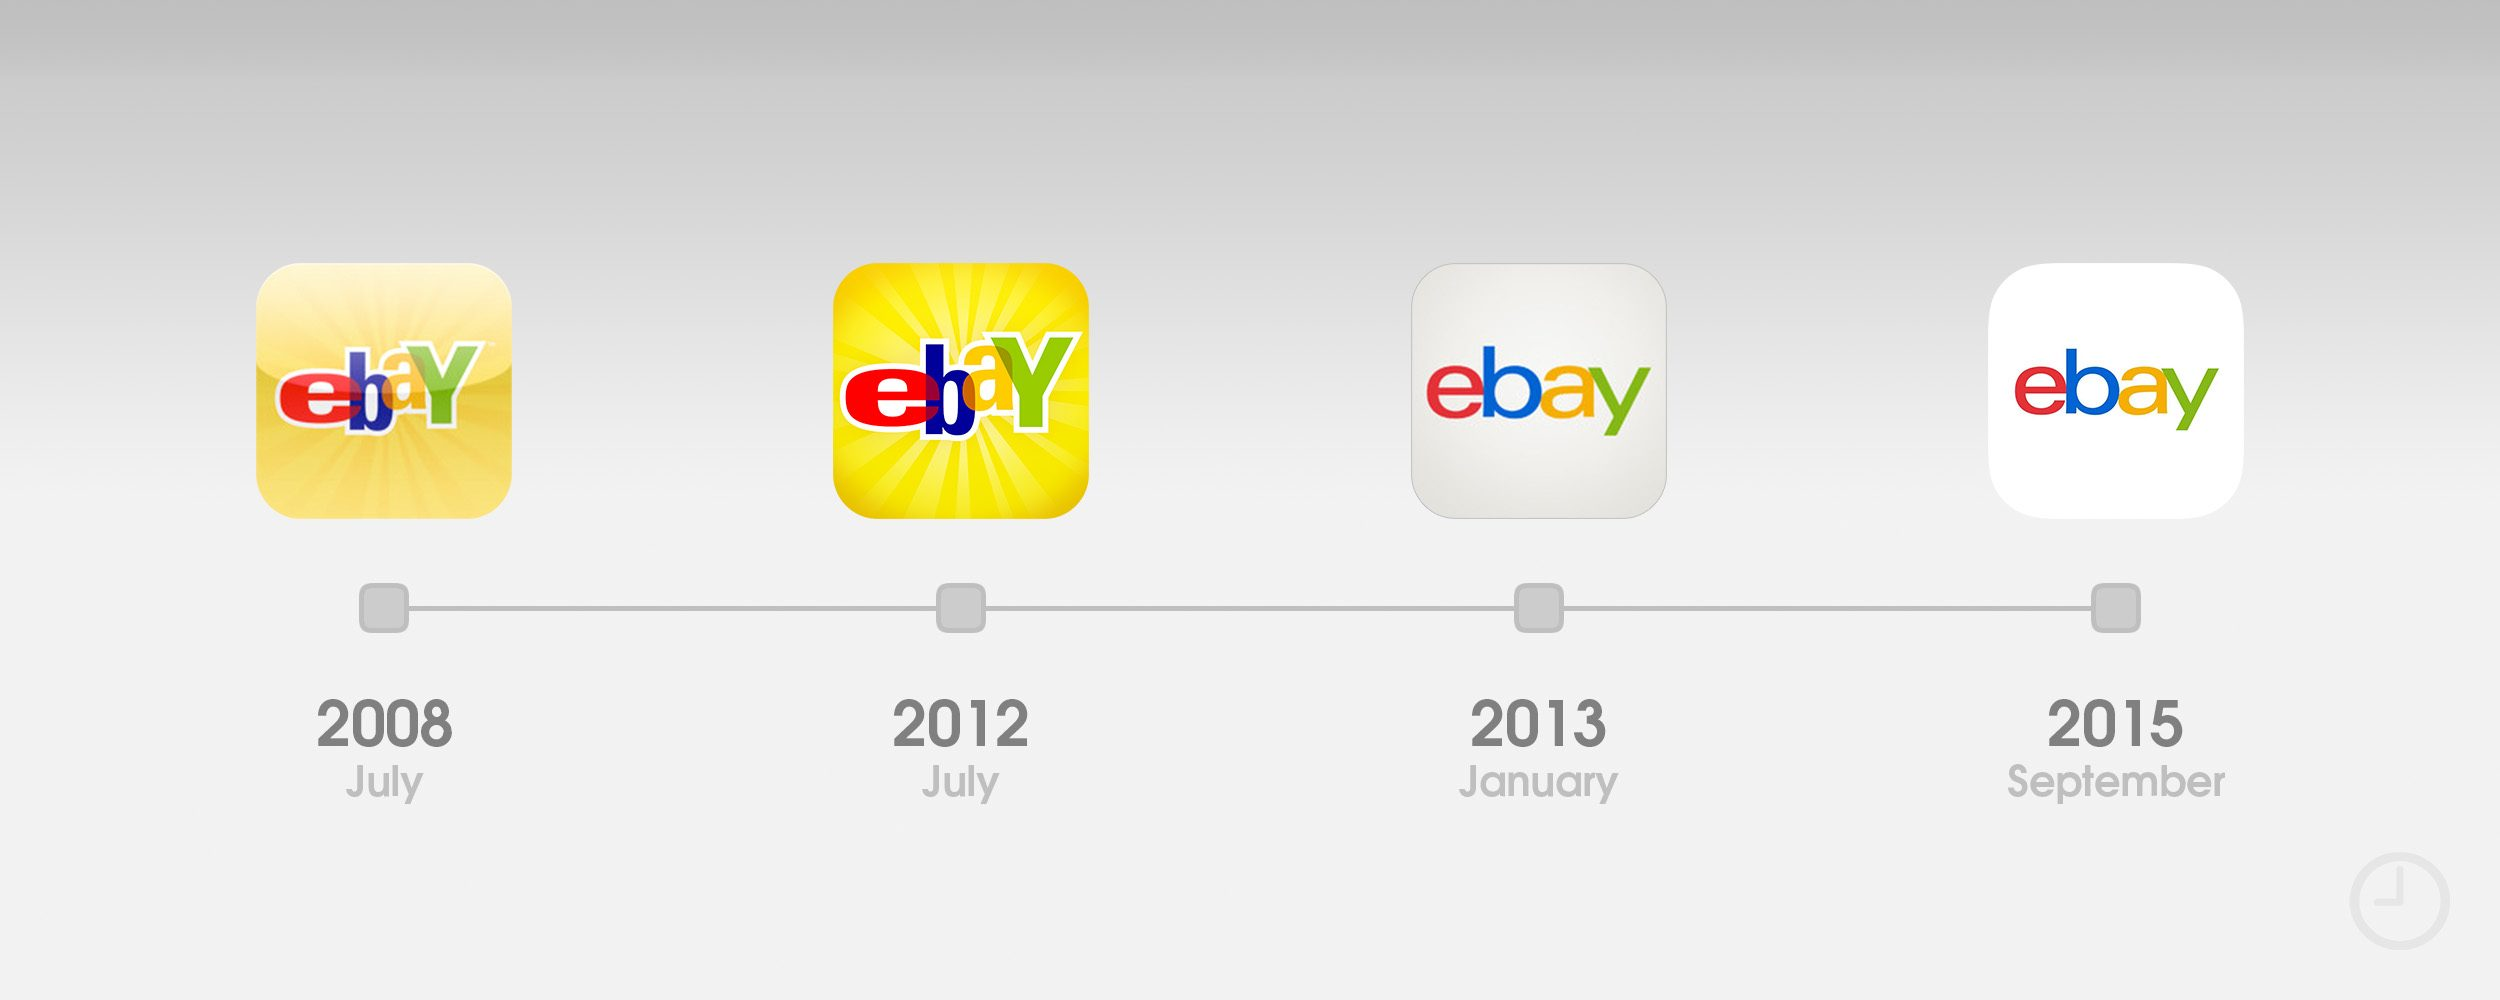 ebay-icons